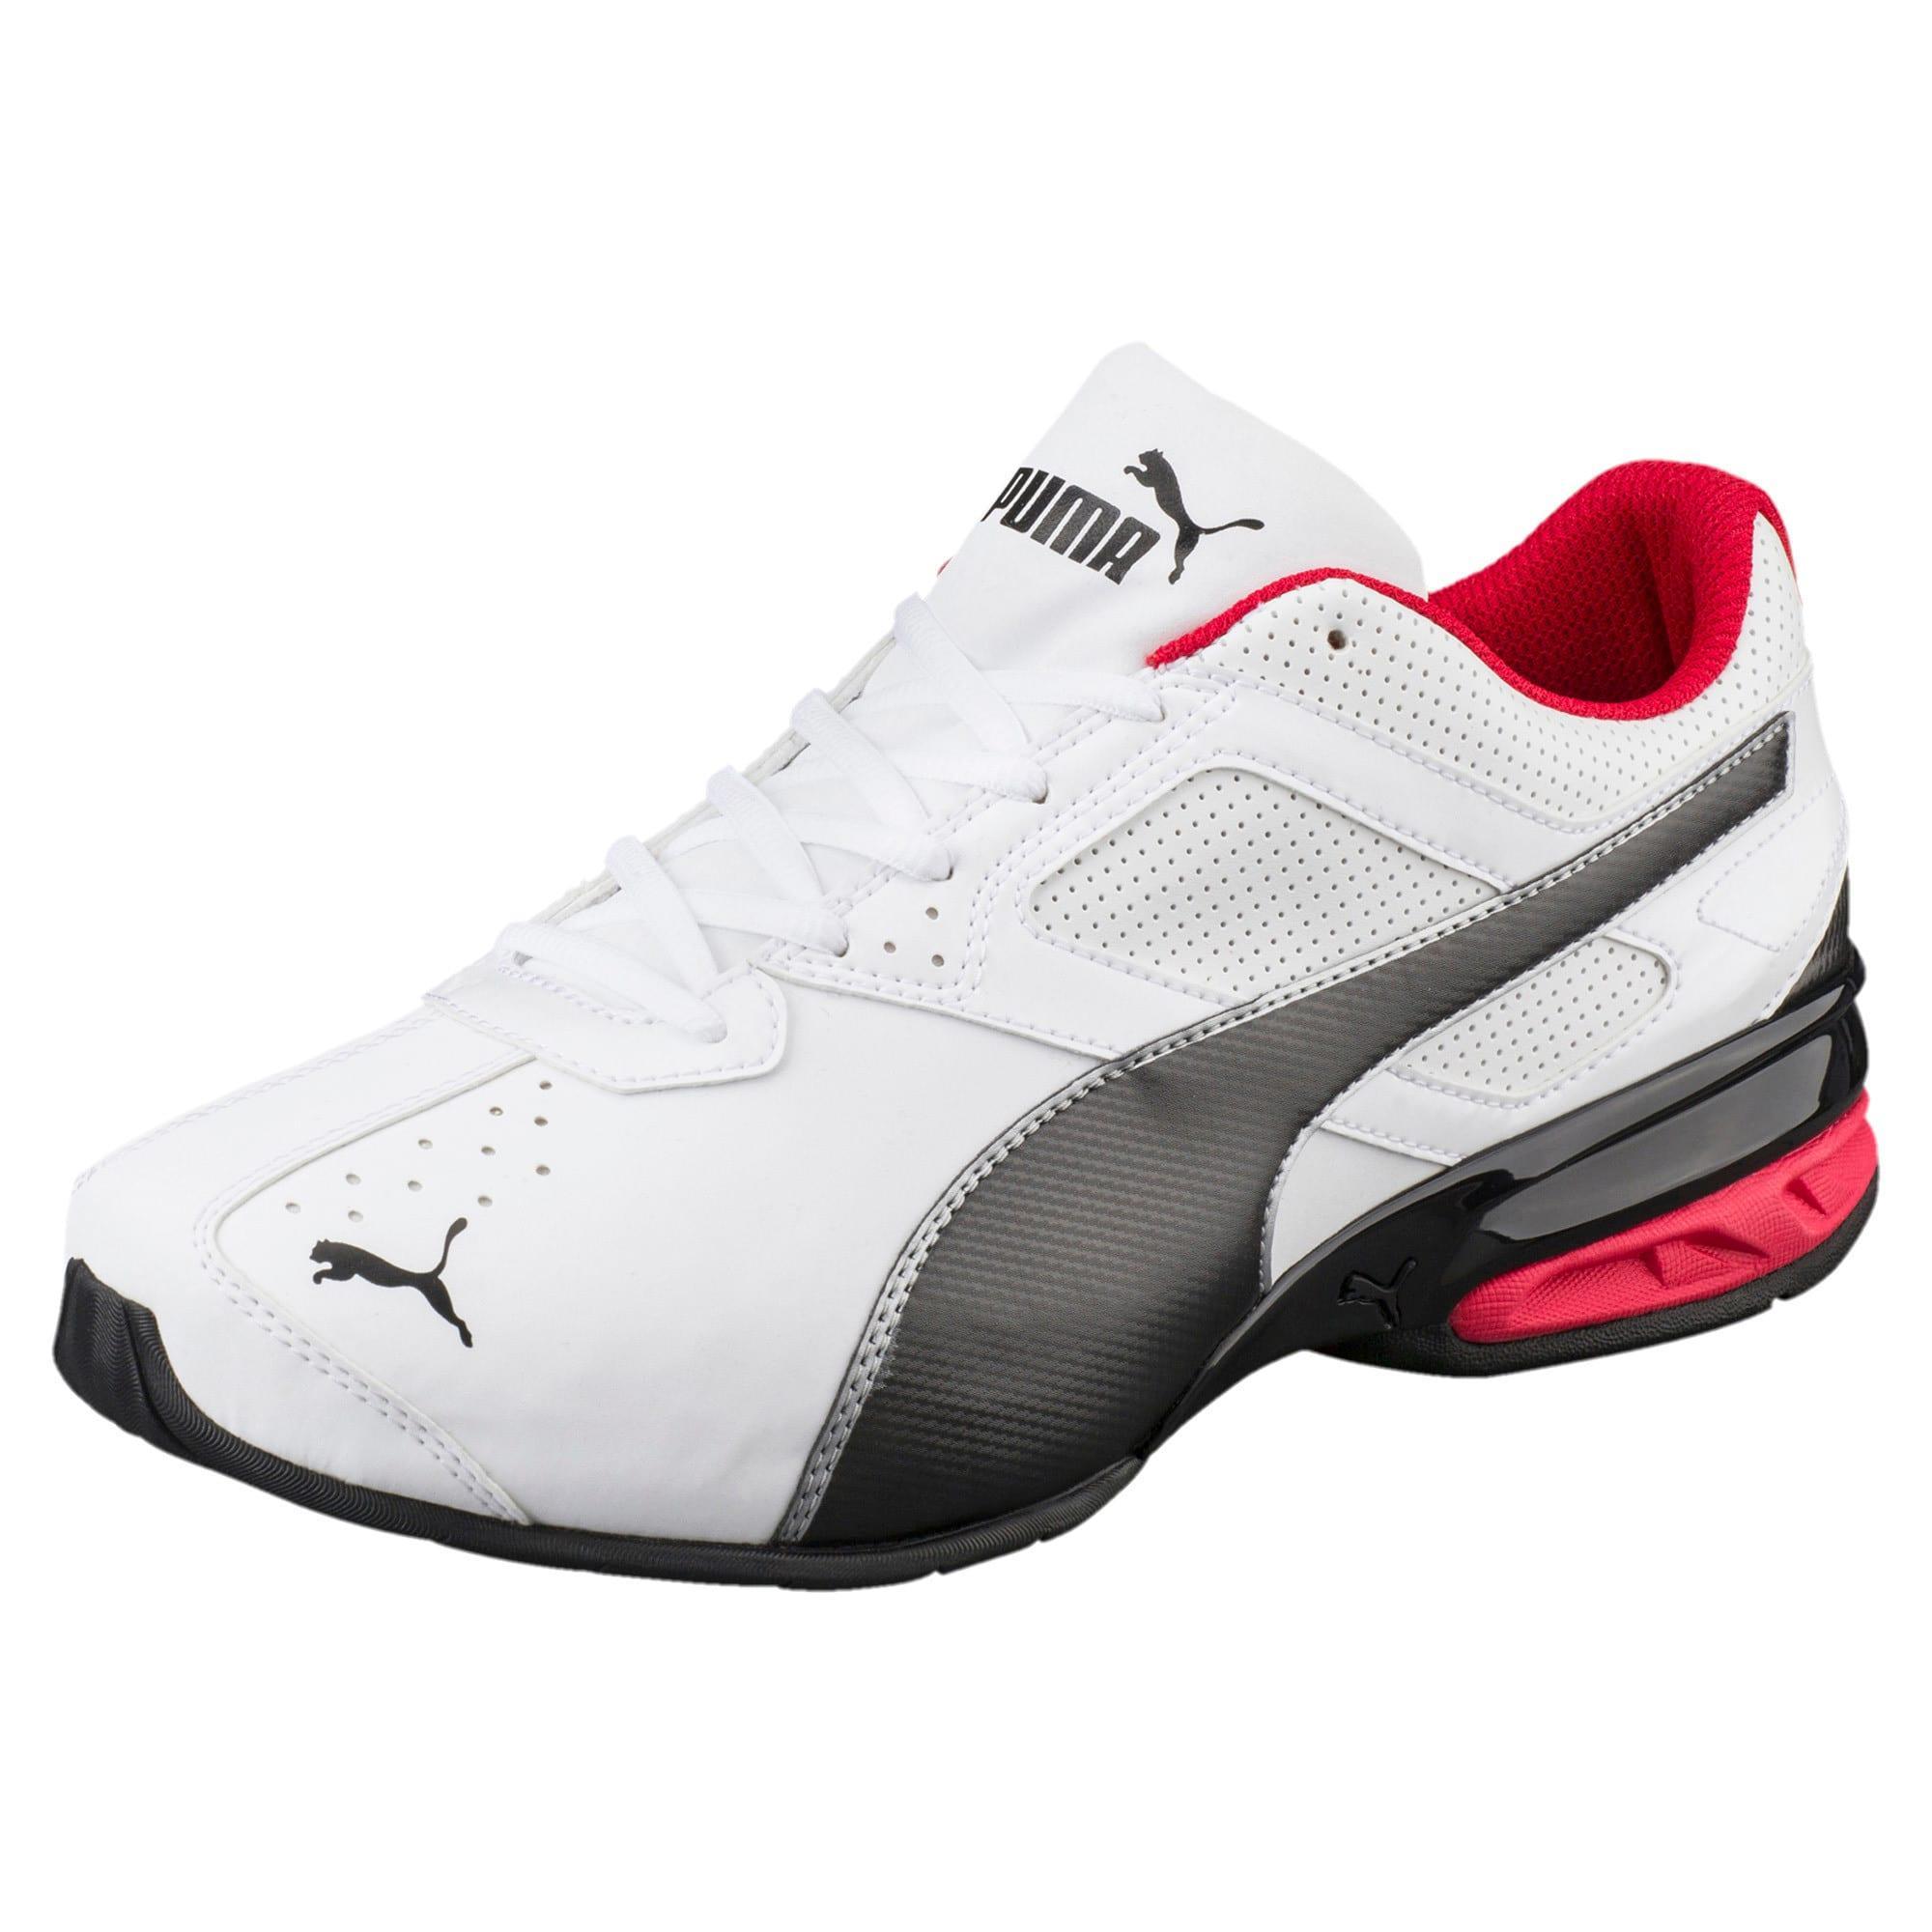 PUMA Synthetic Tazon 6 Fm Wide Men's Sneakers for Men - Lyst